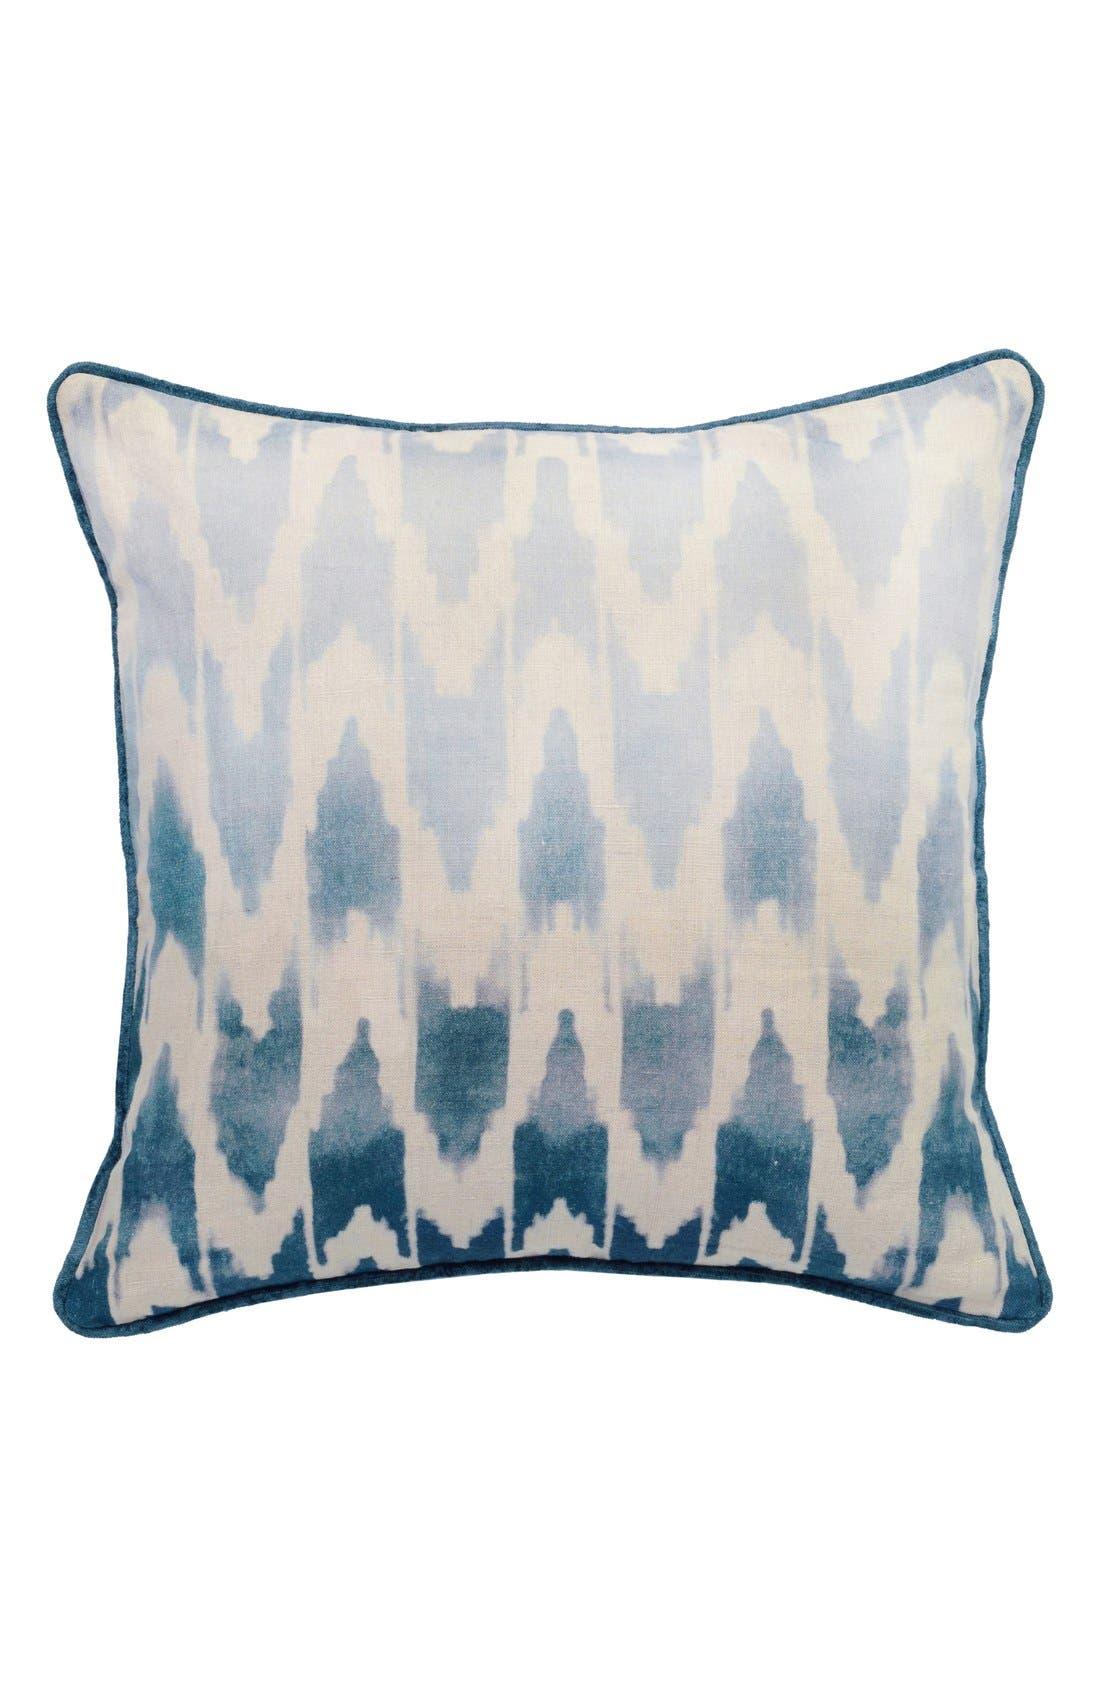 'Neva' Decorative Pillow,                             Main thumbnail 1, color,                             400